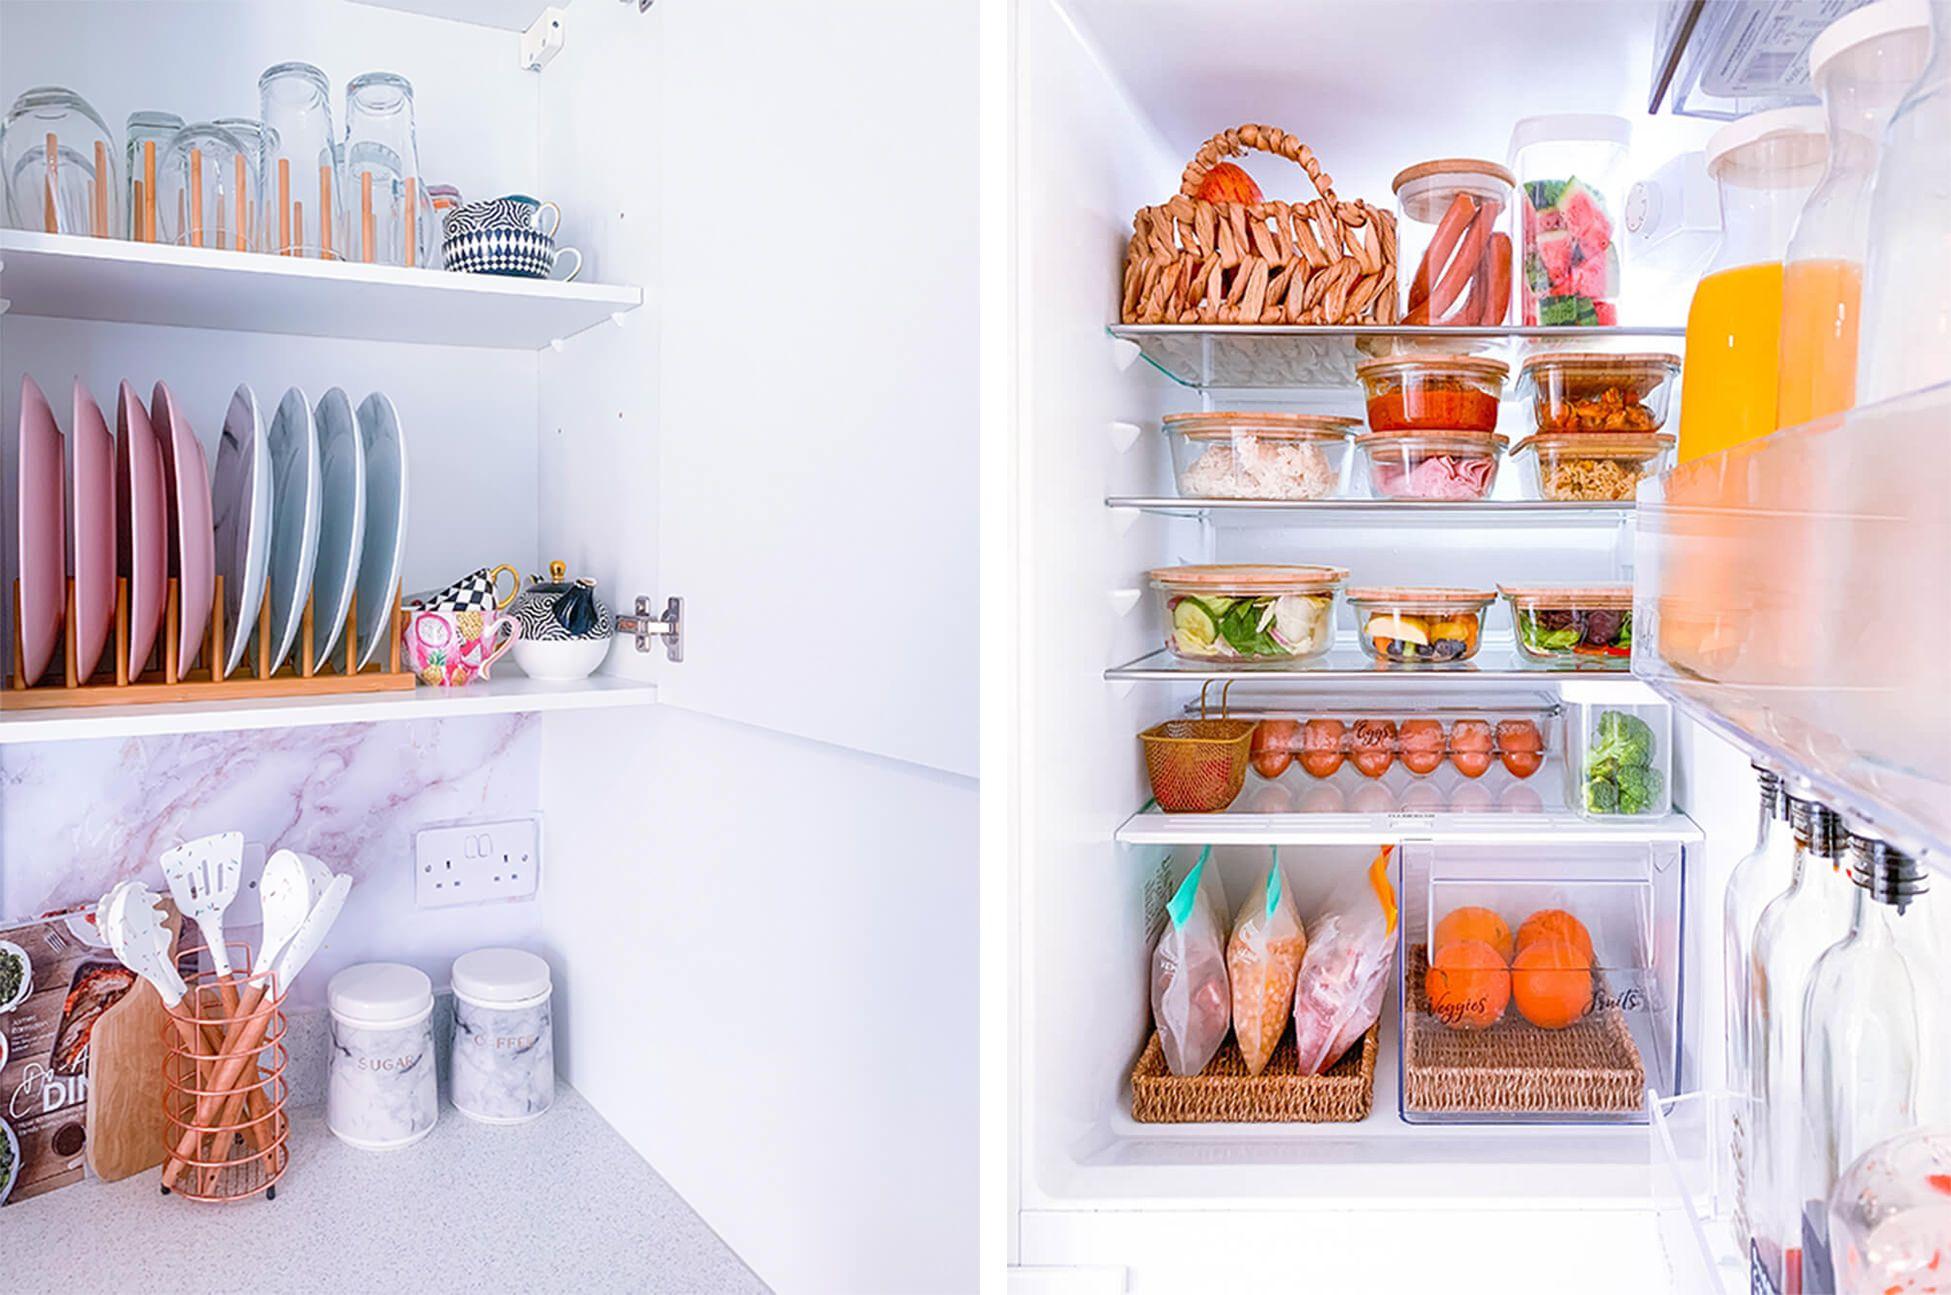 Tableware beautifully organised on a white kitchen shelf